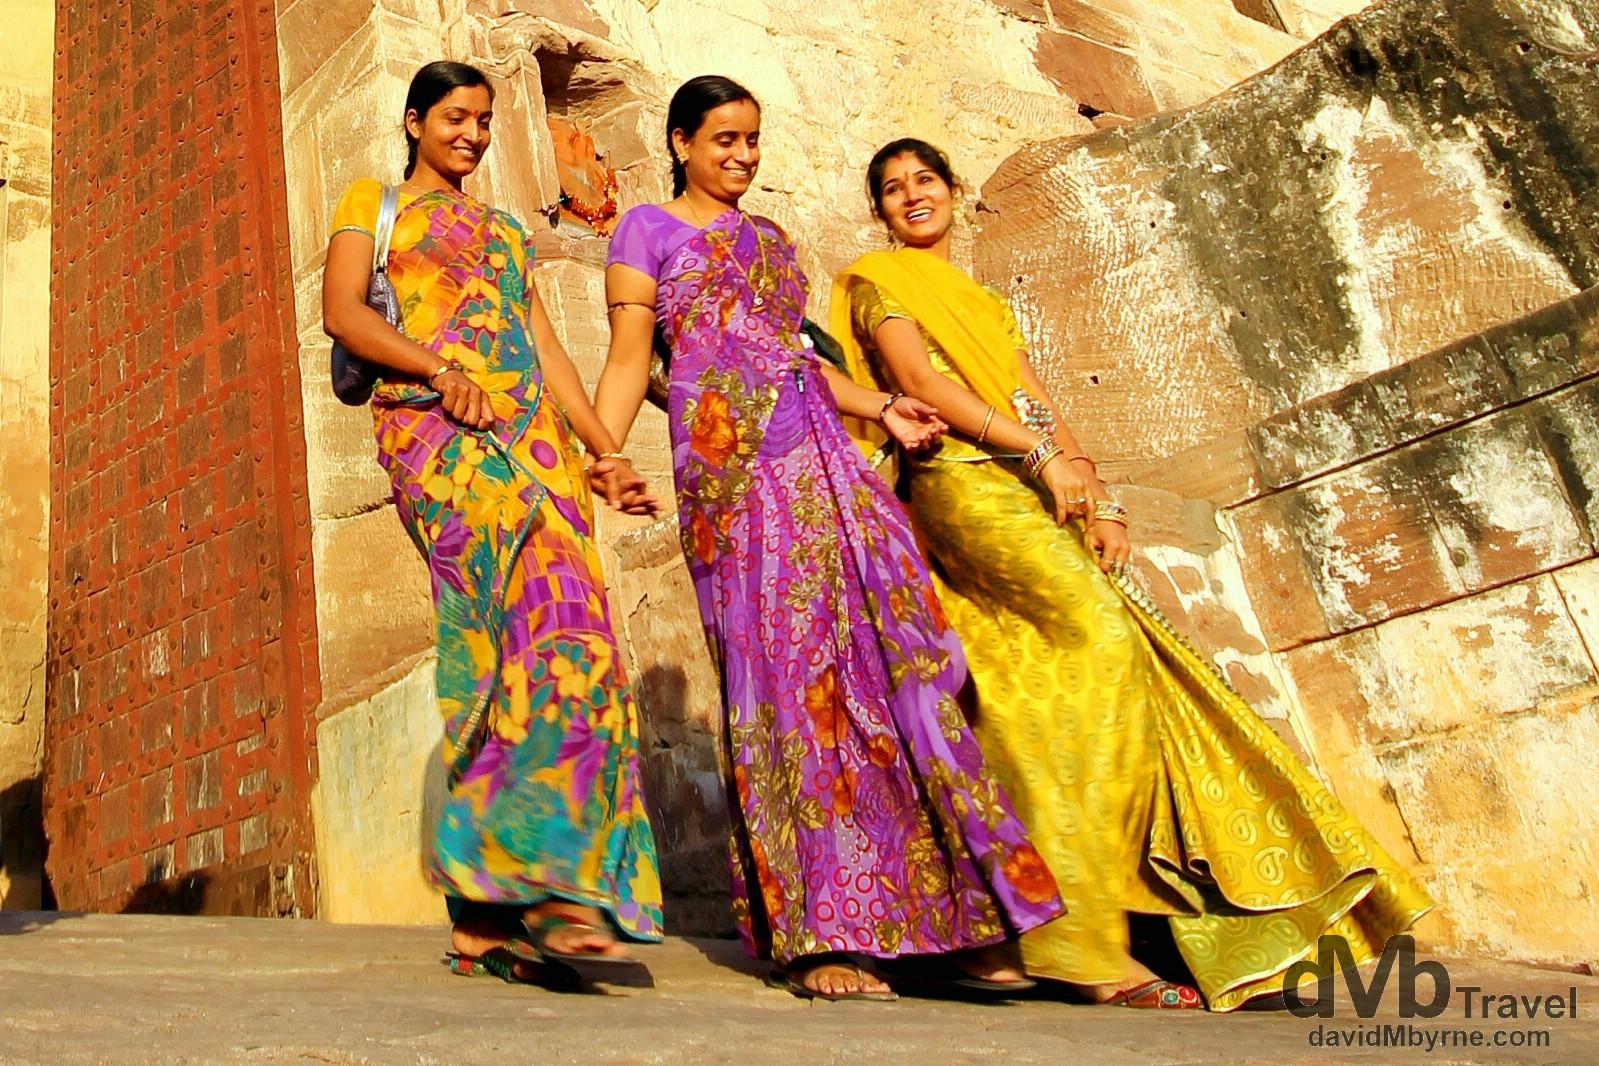 Late afternoon sunlight illuminates three ladies exiting the Mehrangarh Fort in Jodhpur, Rajasthan, India. October 6th 2012.